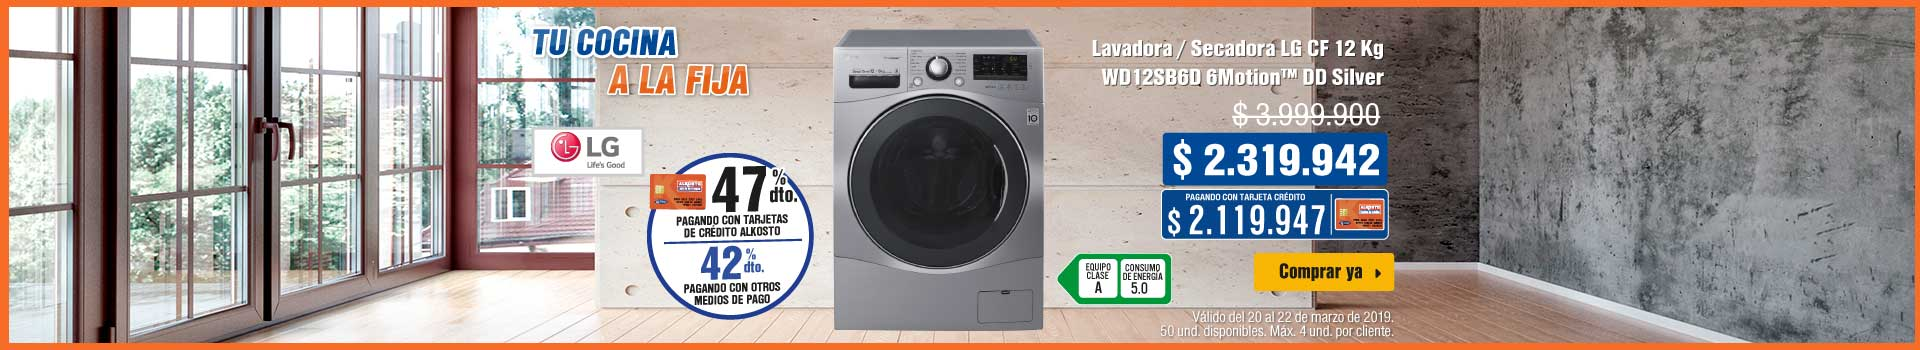 AK-KT-mayores-3-ELECT-BCAT-lavadoras-LG-200319